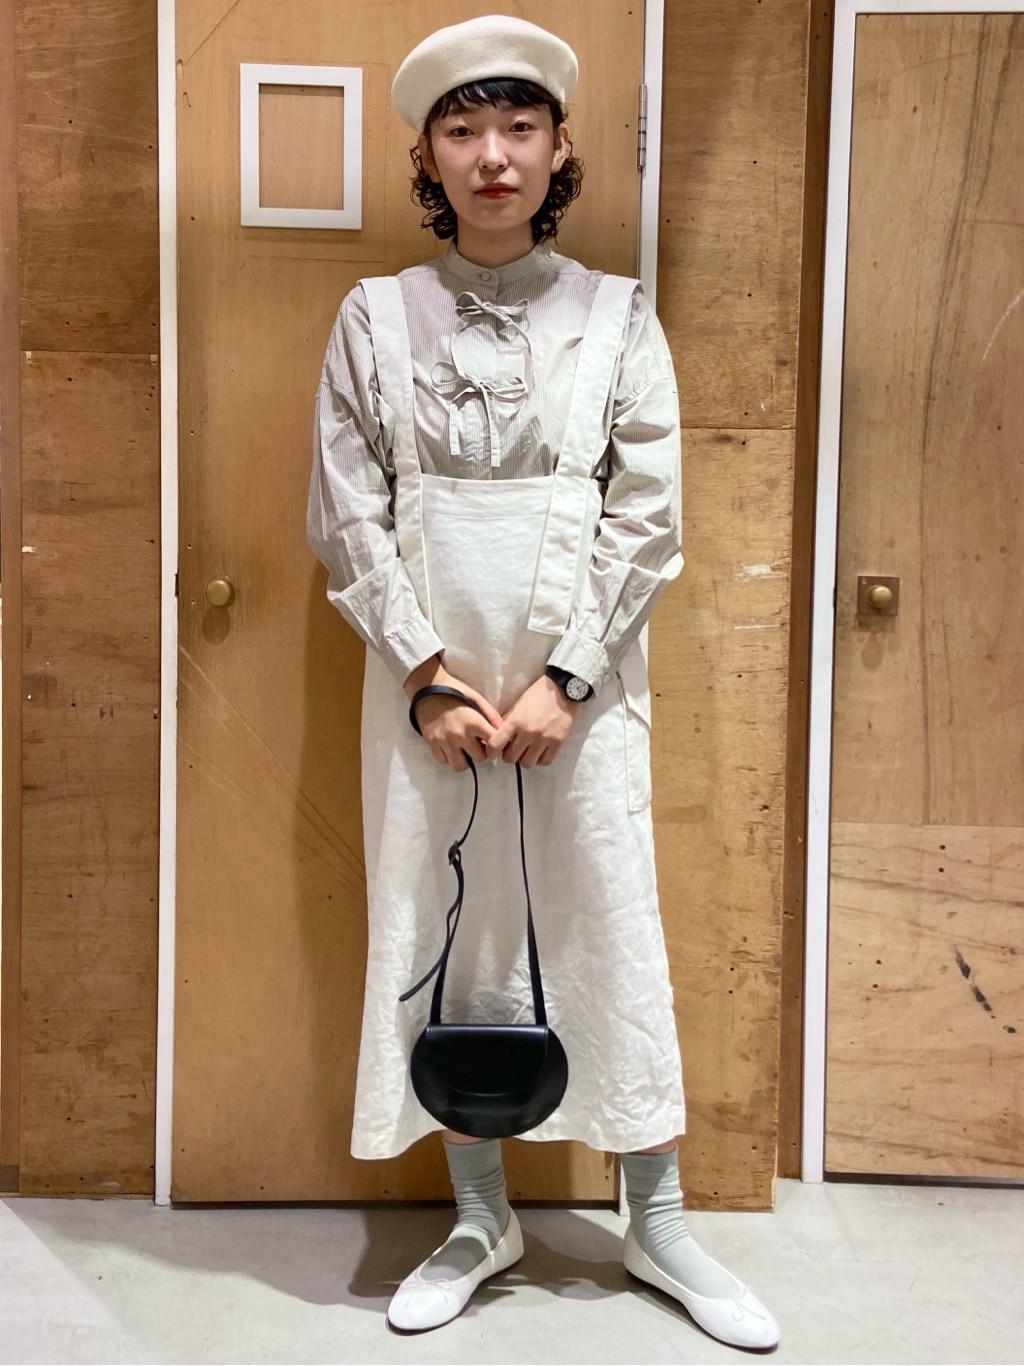 bulle de savon 新宿ミロード 身長:159cm 2020.08.30